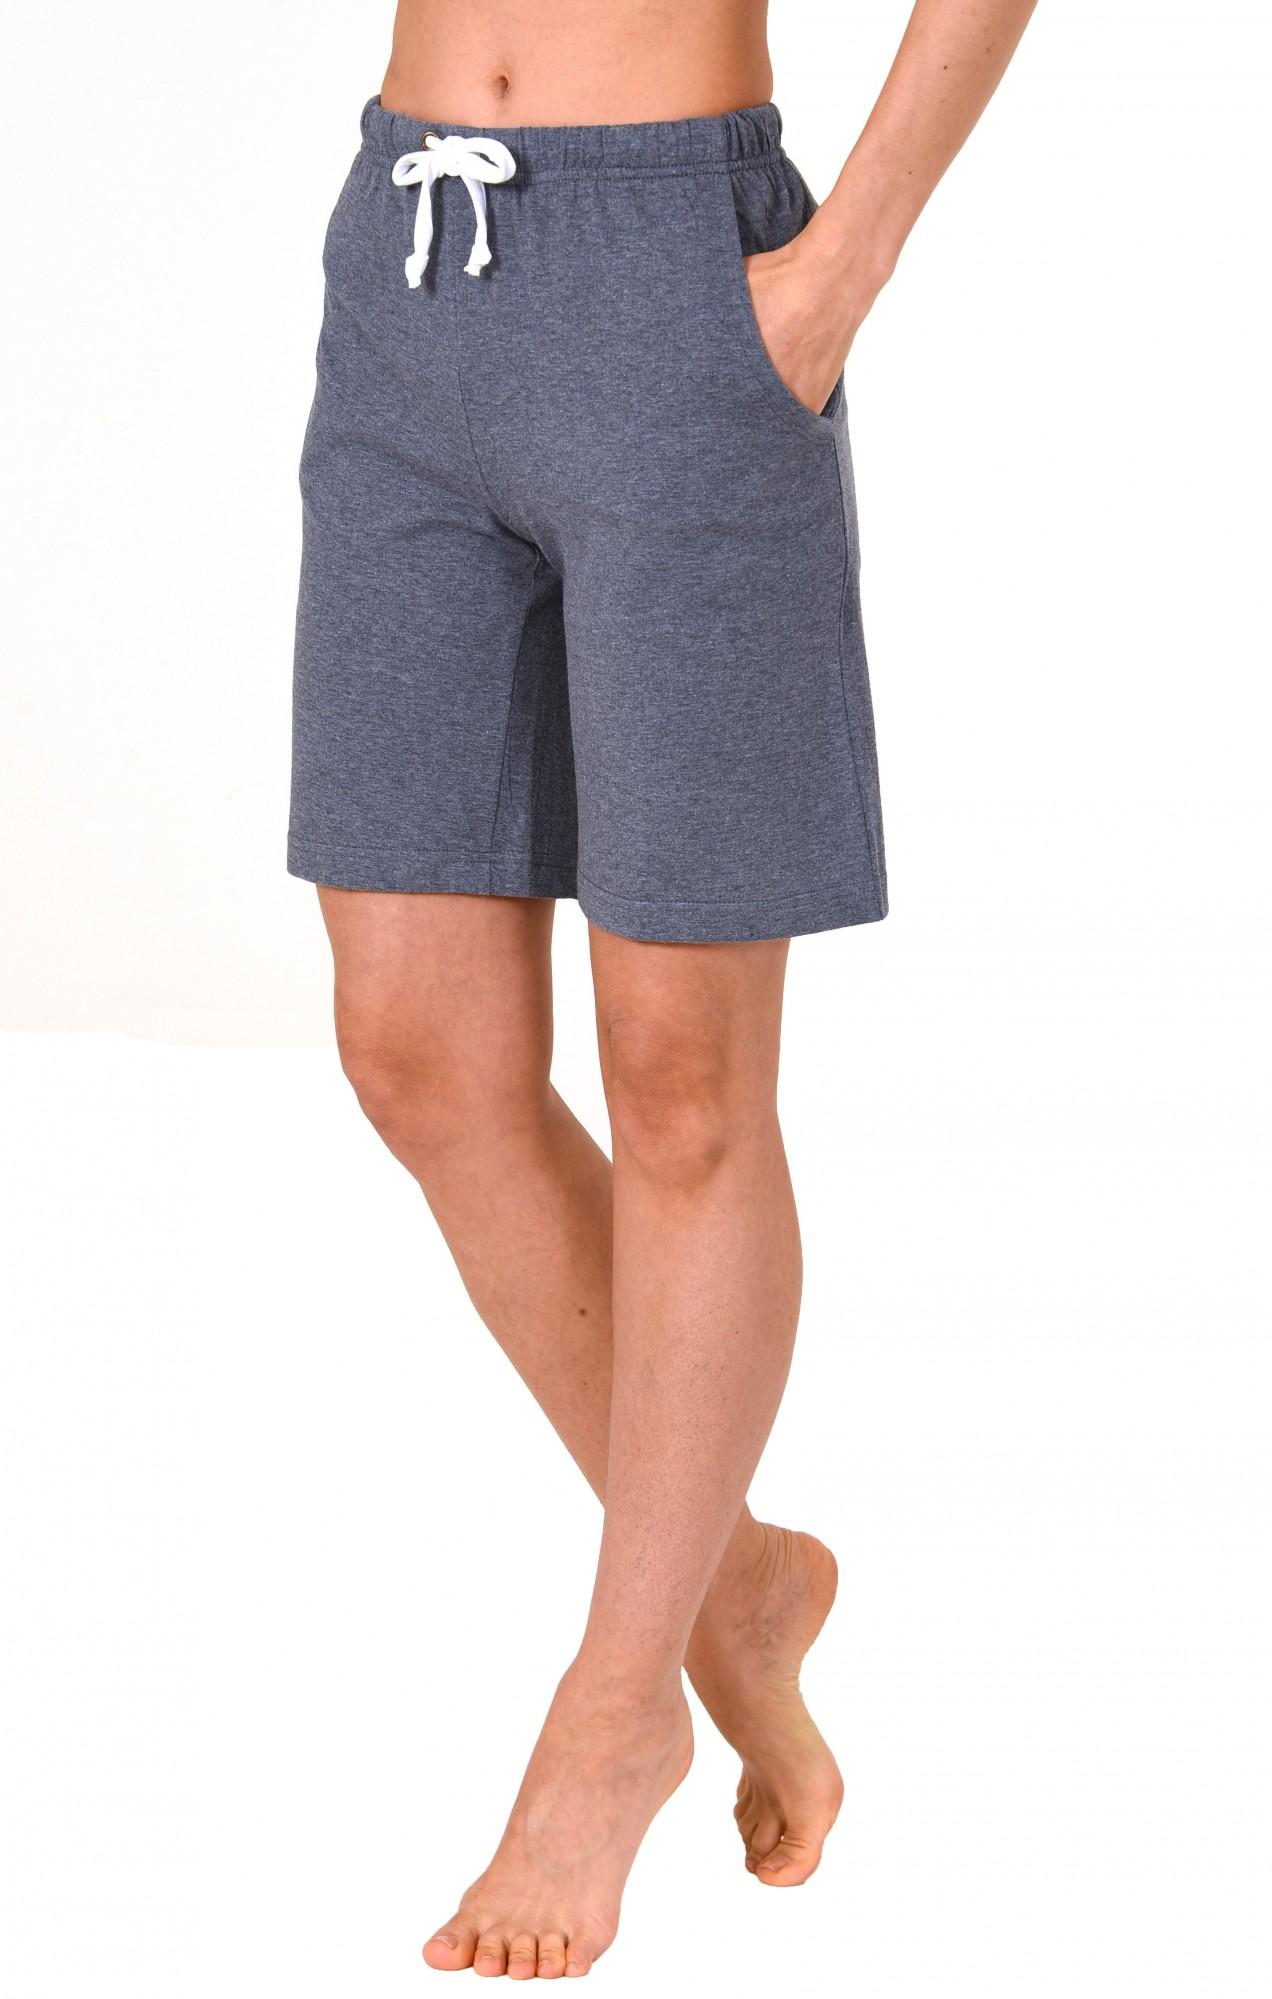 Damen Pyjama Bermuda kurze Hose  - Mix & Match - ideal zum kombinieren  224 90 902 – Bild 5